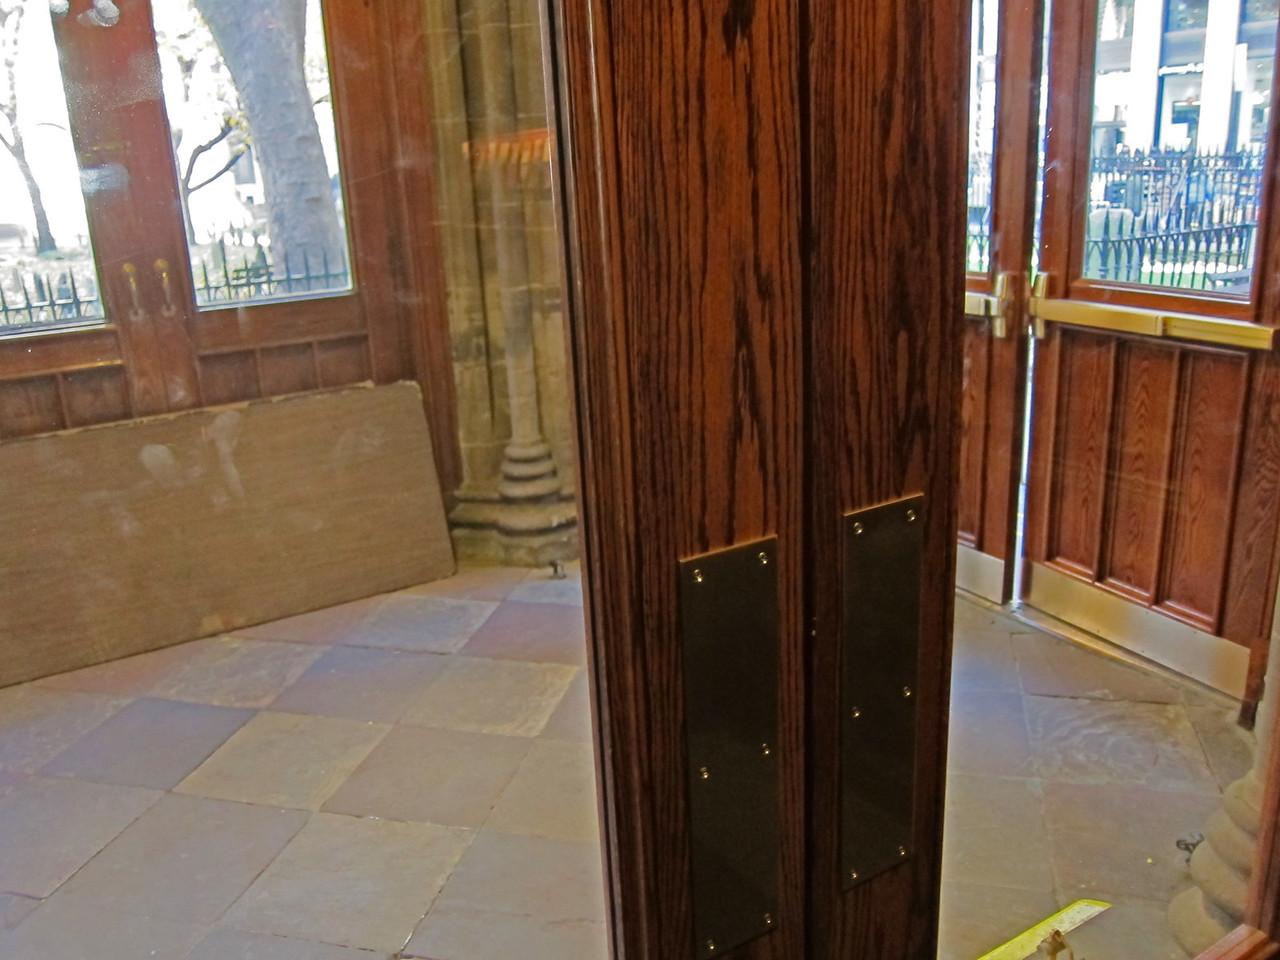 xTrinity Wall Street Church_2013-11-20_4659_north entryway vestibule, Broadway on right